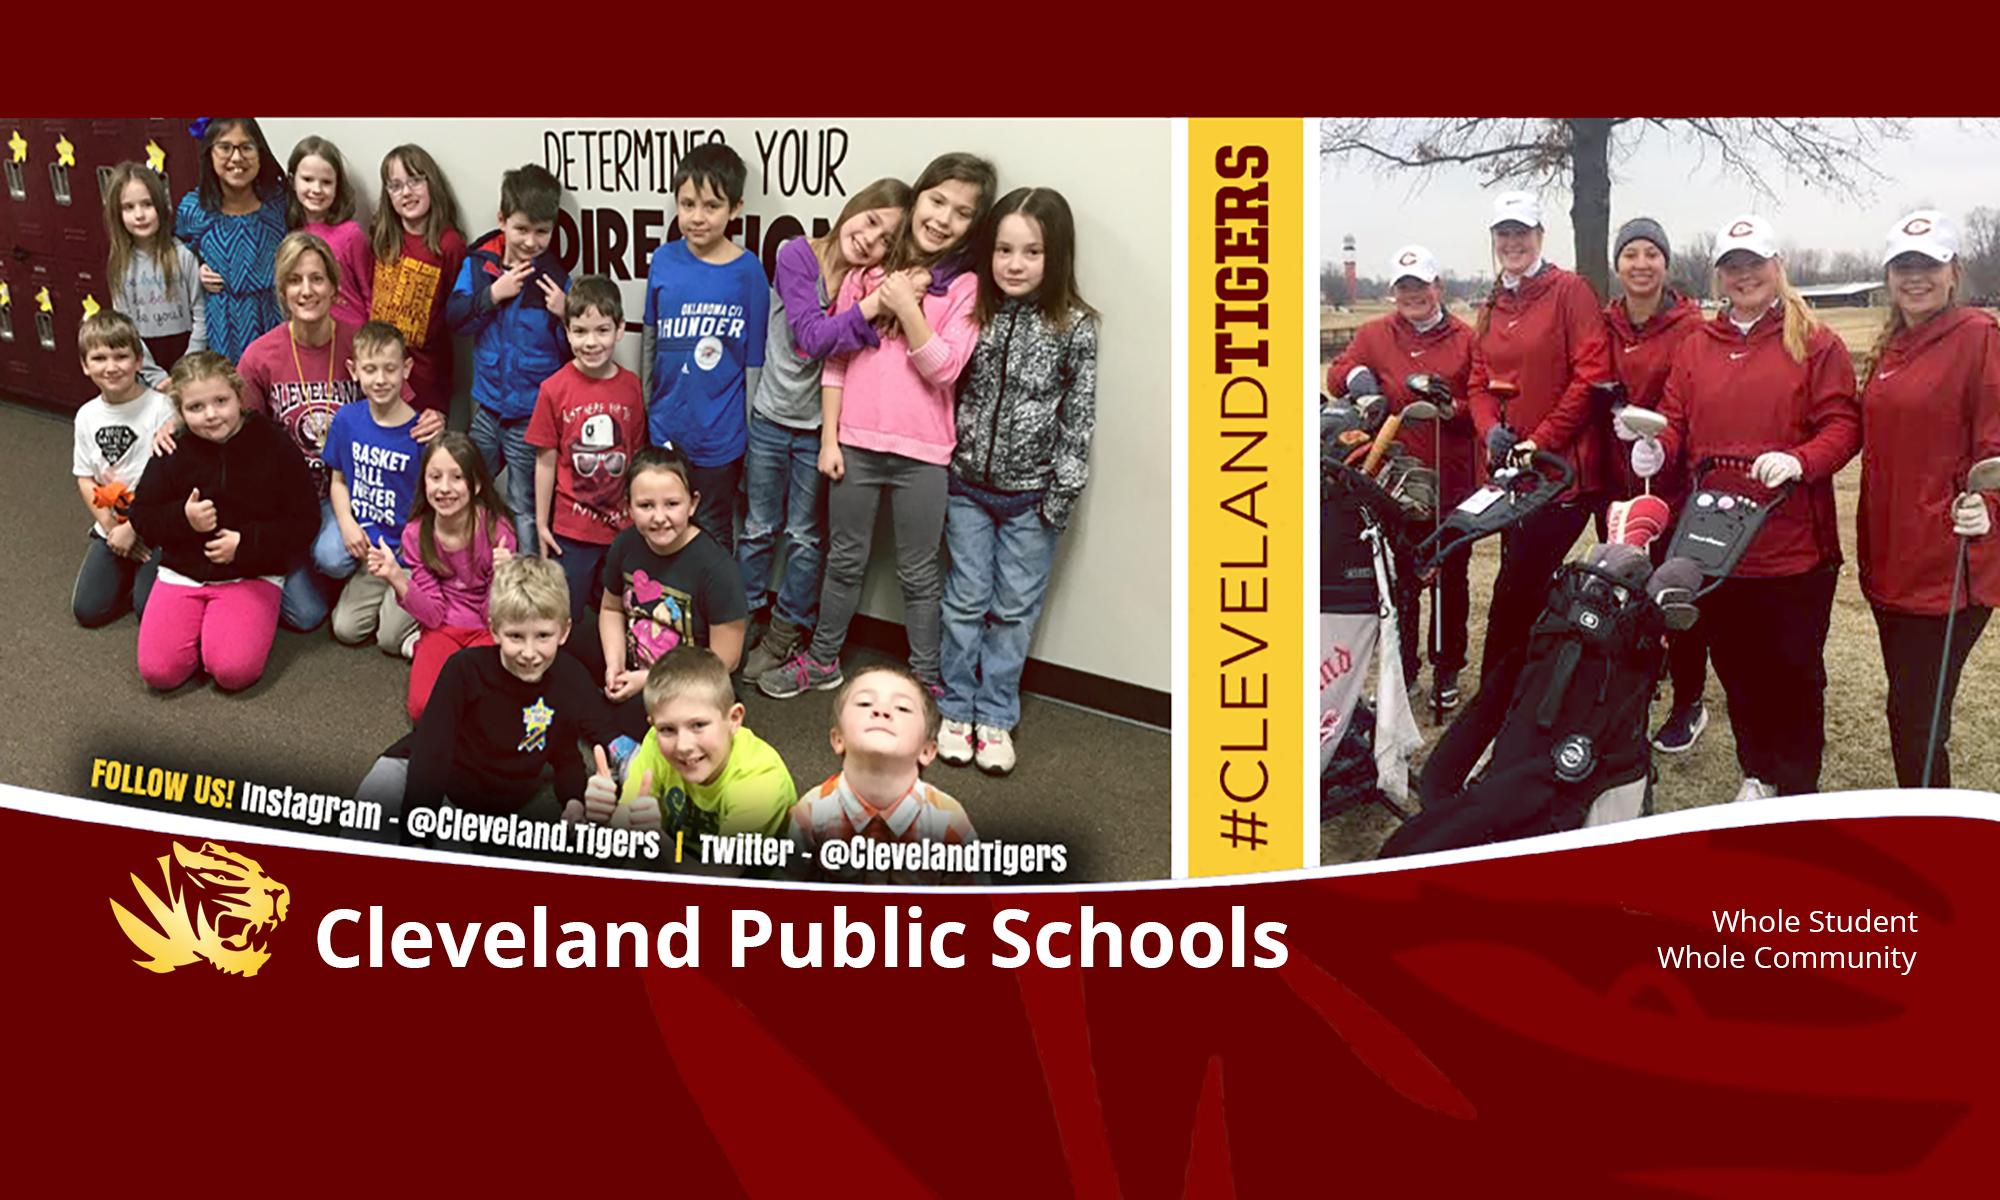 Cleveland Public Schools